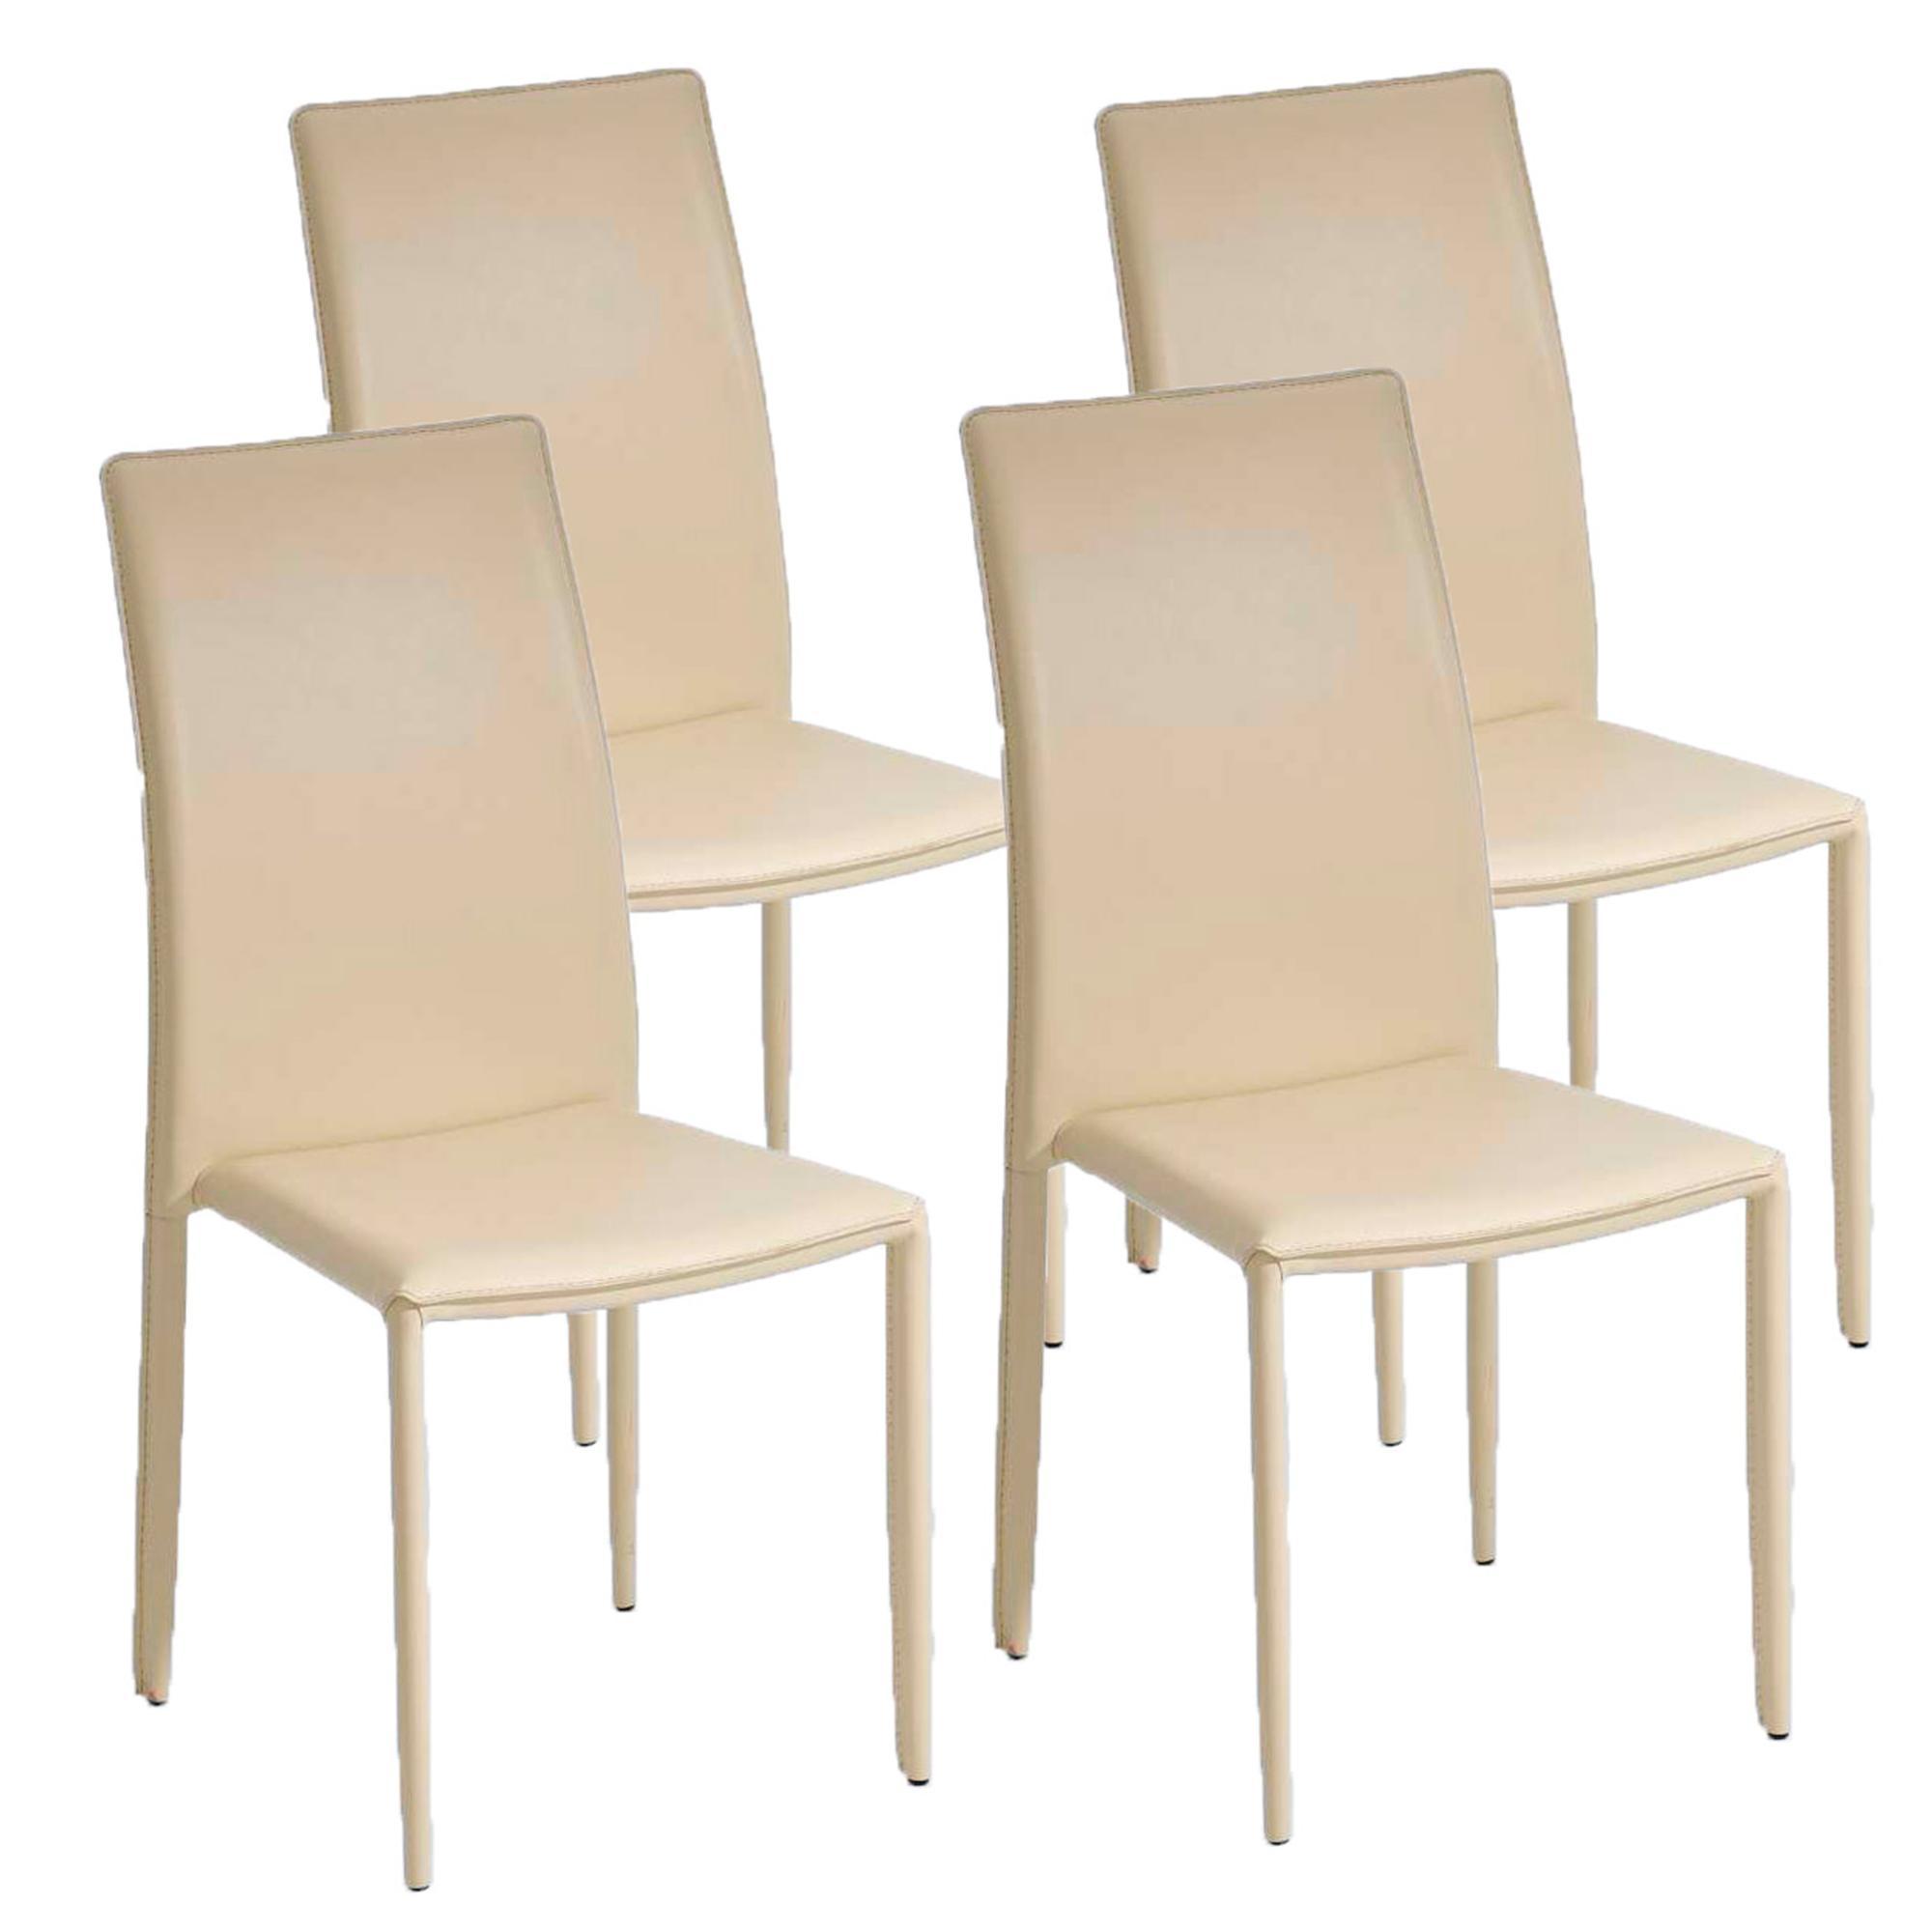 ce2d8febdd8ca Lote 4 sillas de comedor o cocina alena apilables color Sillas apilables  comedor